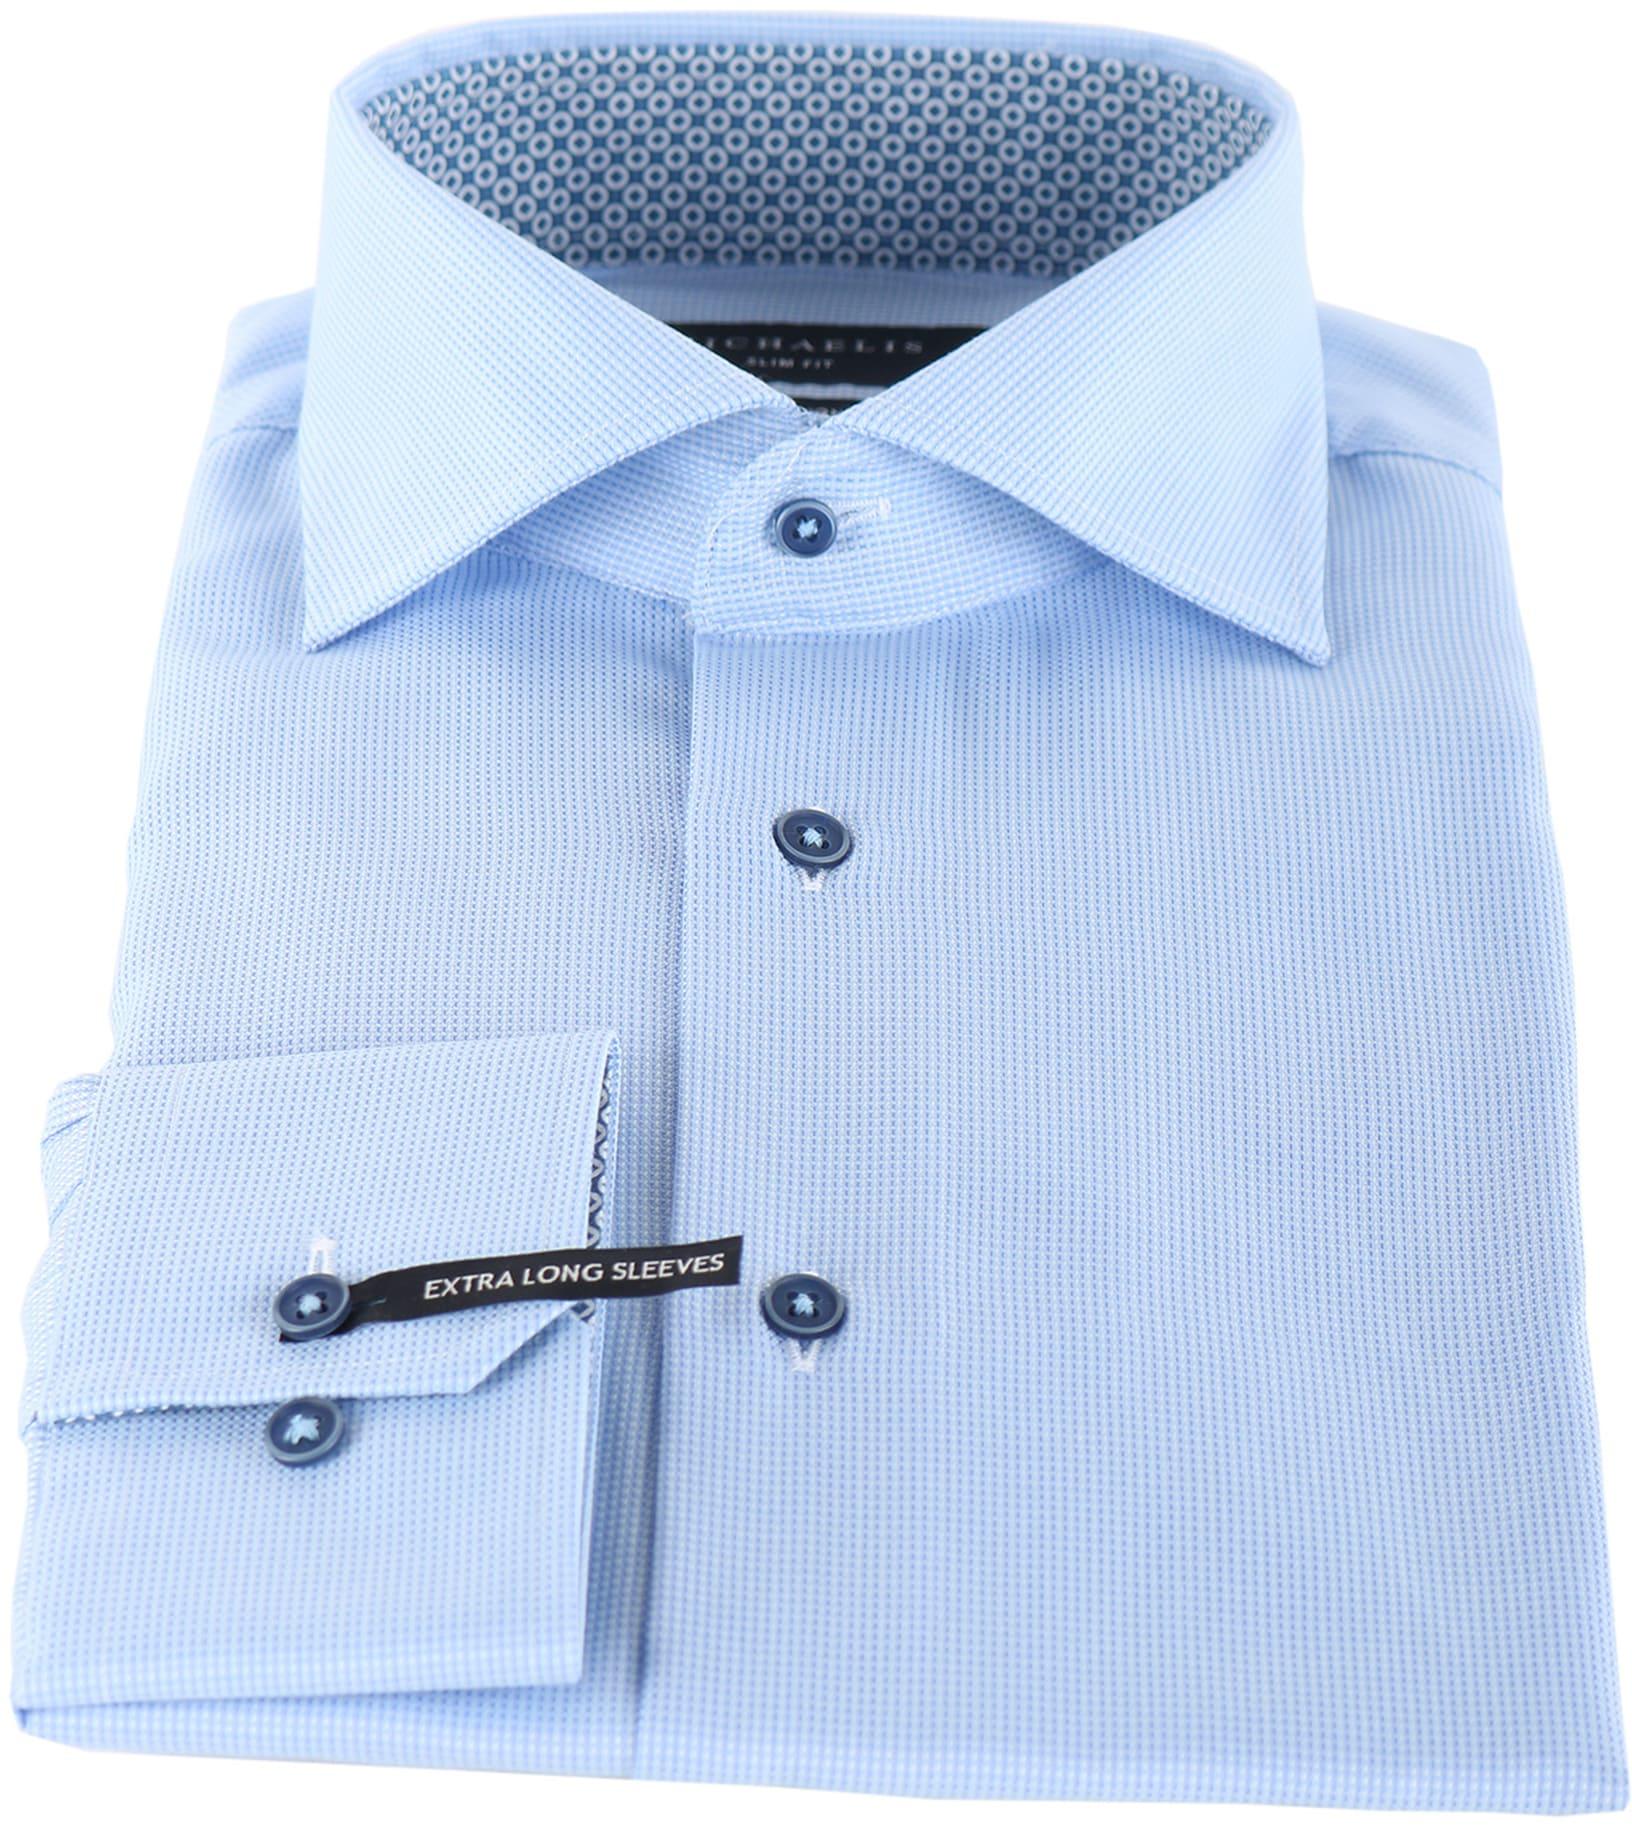 Michaelis Overhemd Dessin Blauw SL7 foto 1